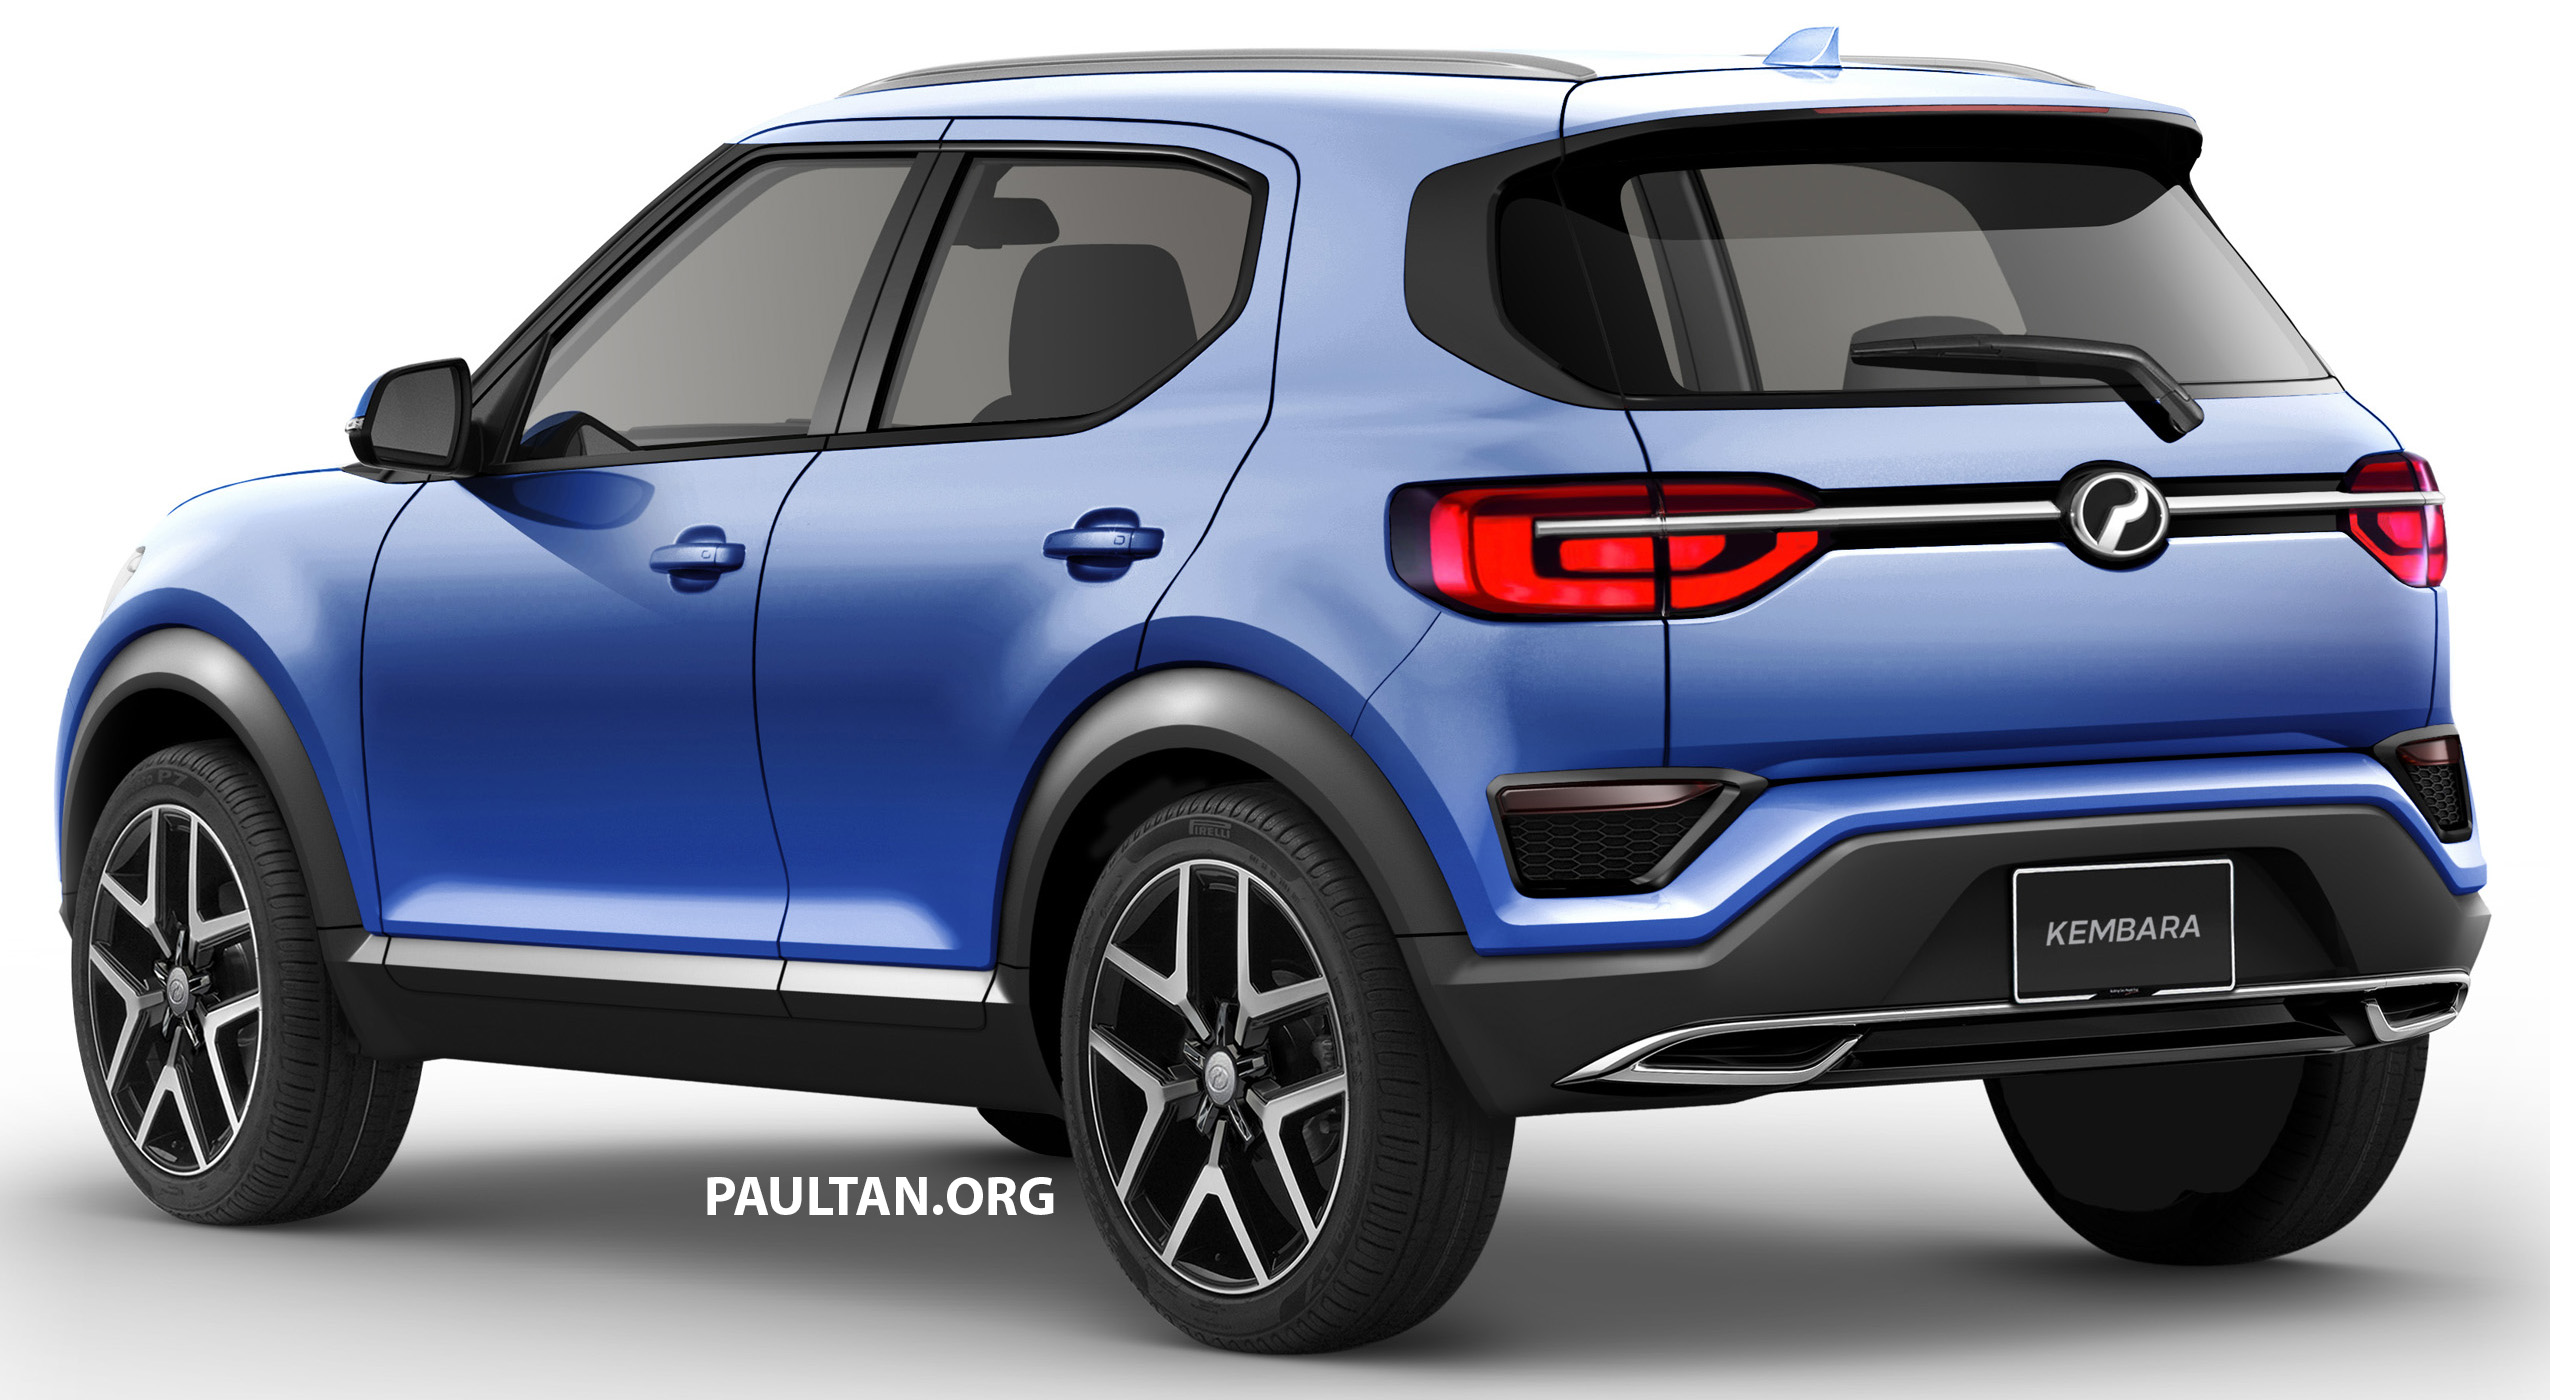 New Myvi 2018 Price >> RENDERED: New Perodua Kembara – P2's next move? Paul Tan - Image 743996